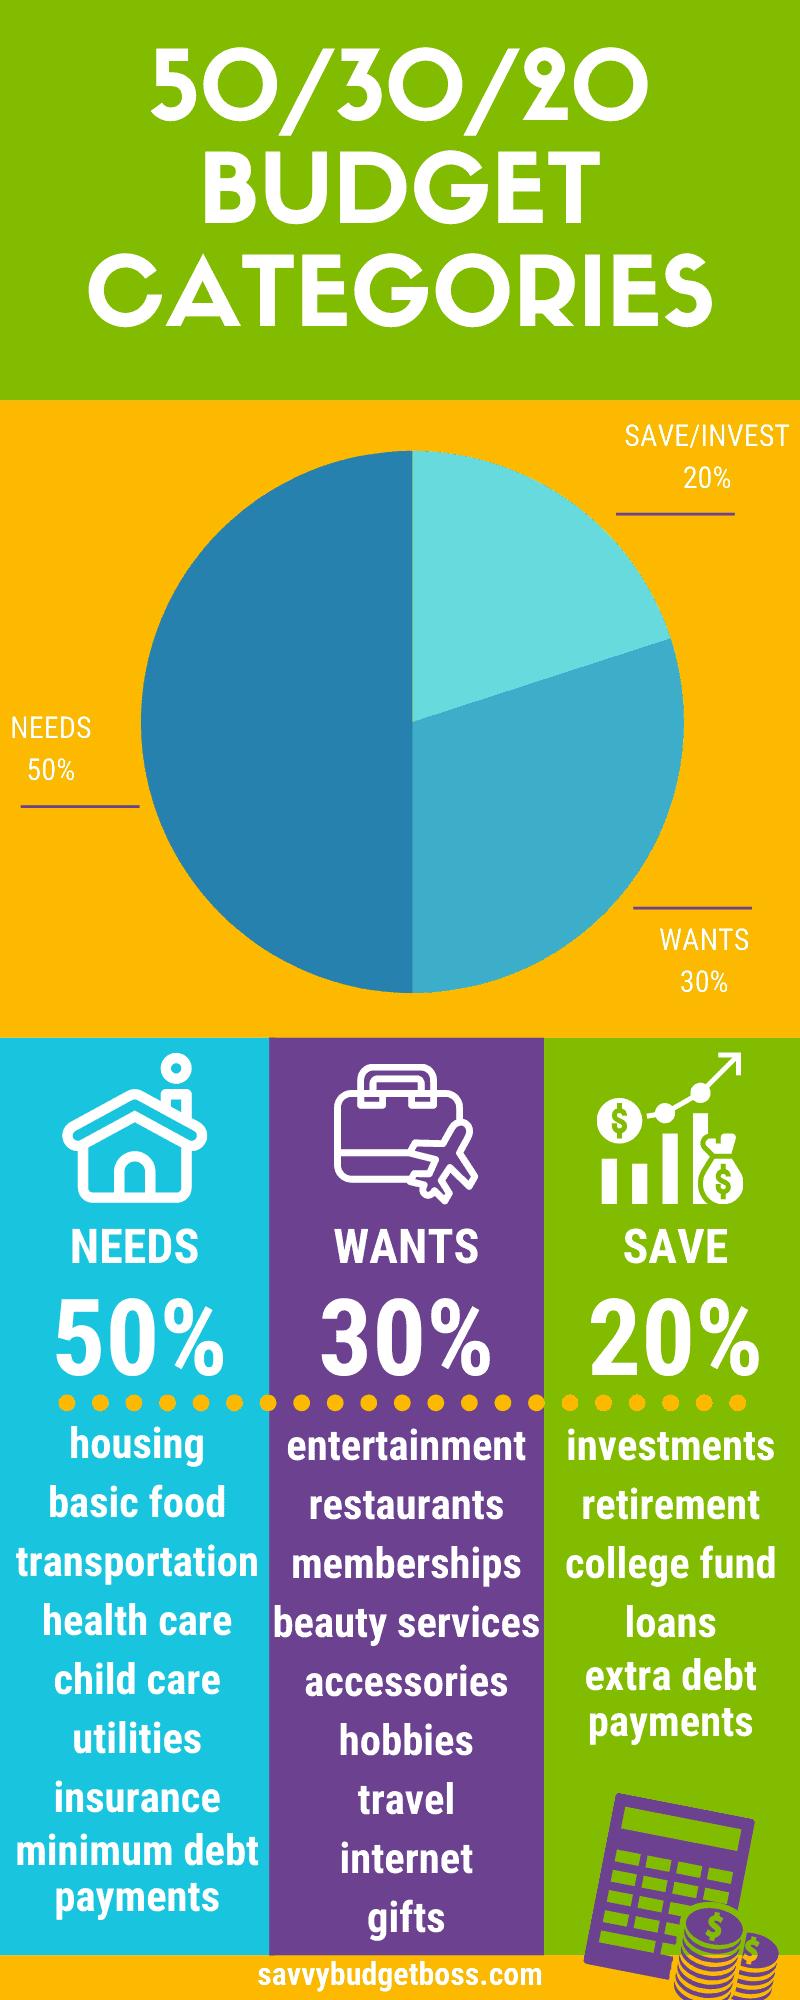 50/20/30 budget infographic